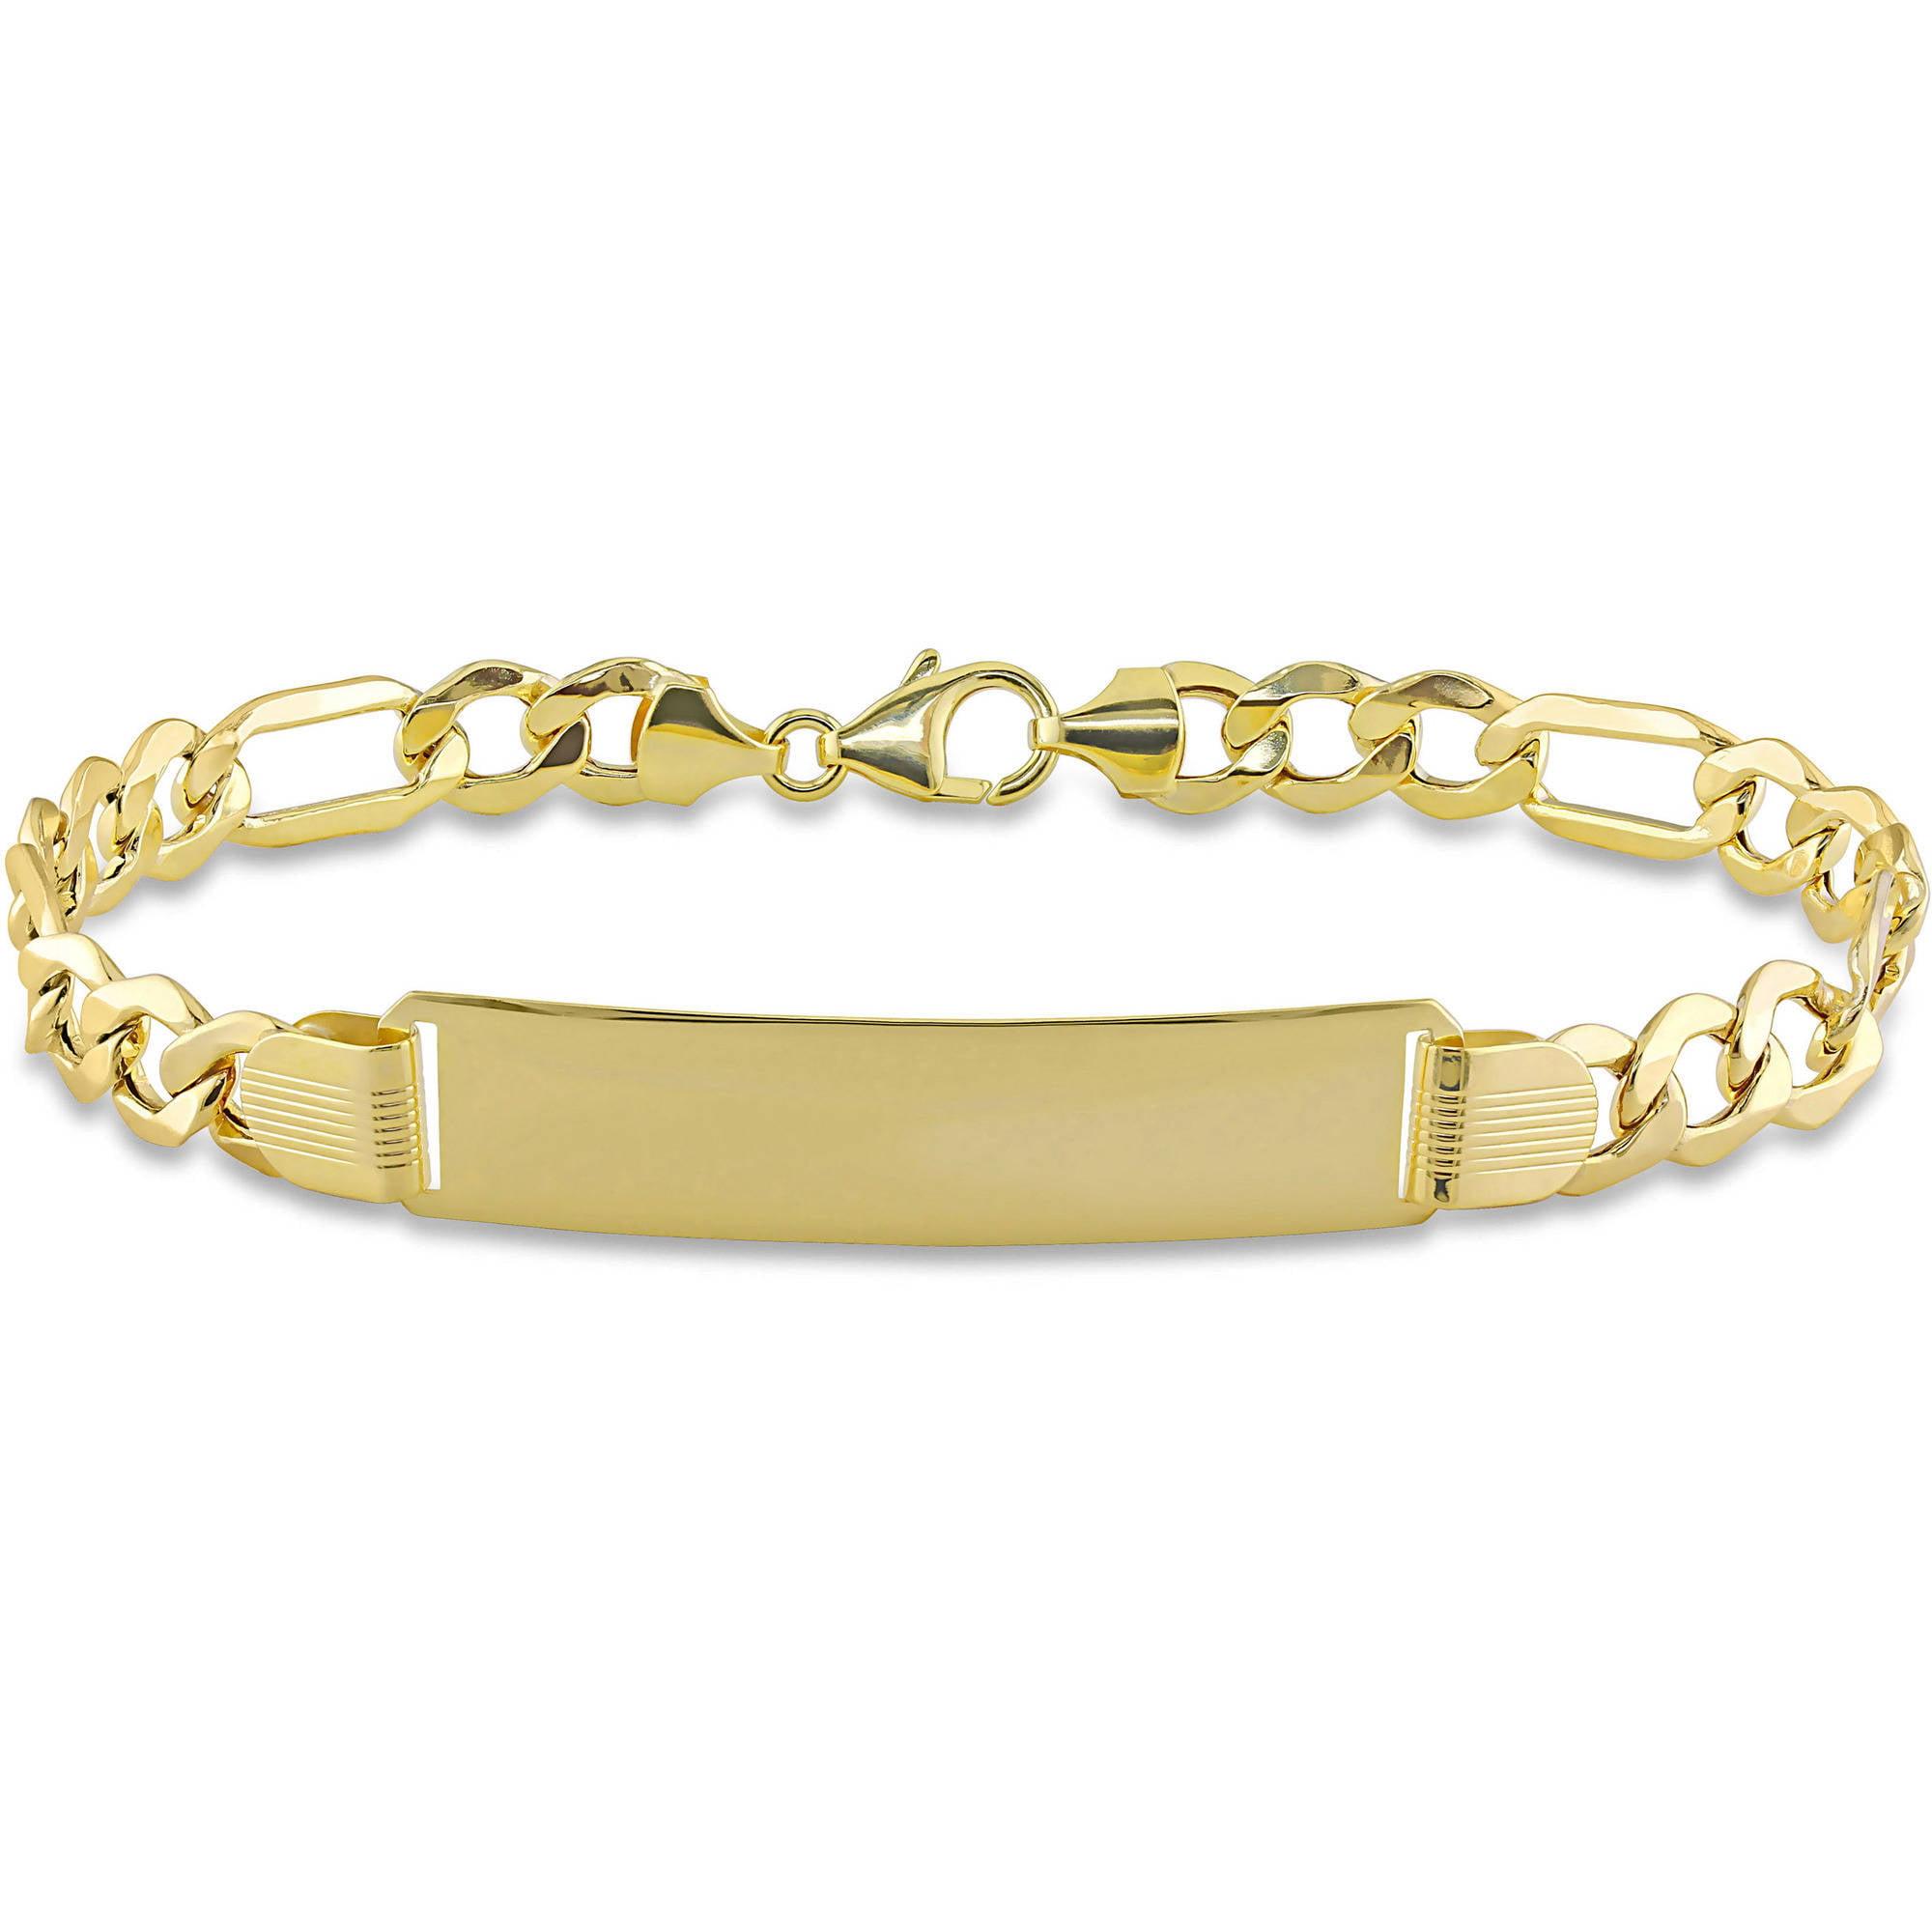 "10kt Yellow Gold Men's ID Figaro Chain Bracelet, 9"" by Delmar Manufacturing LLC"